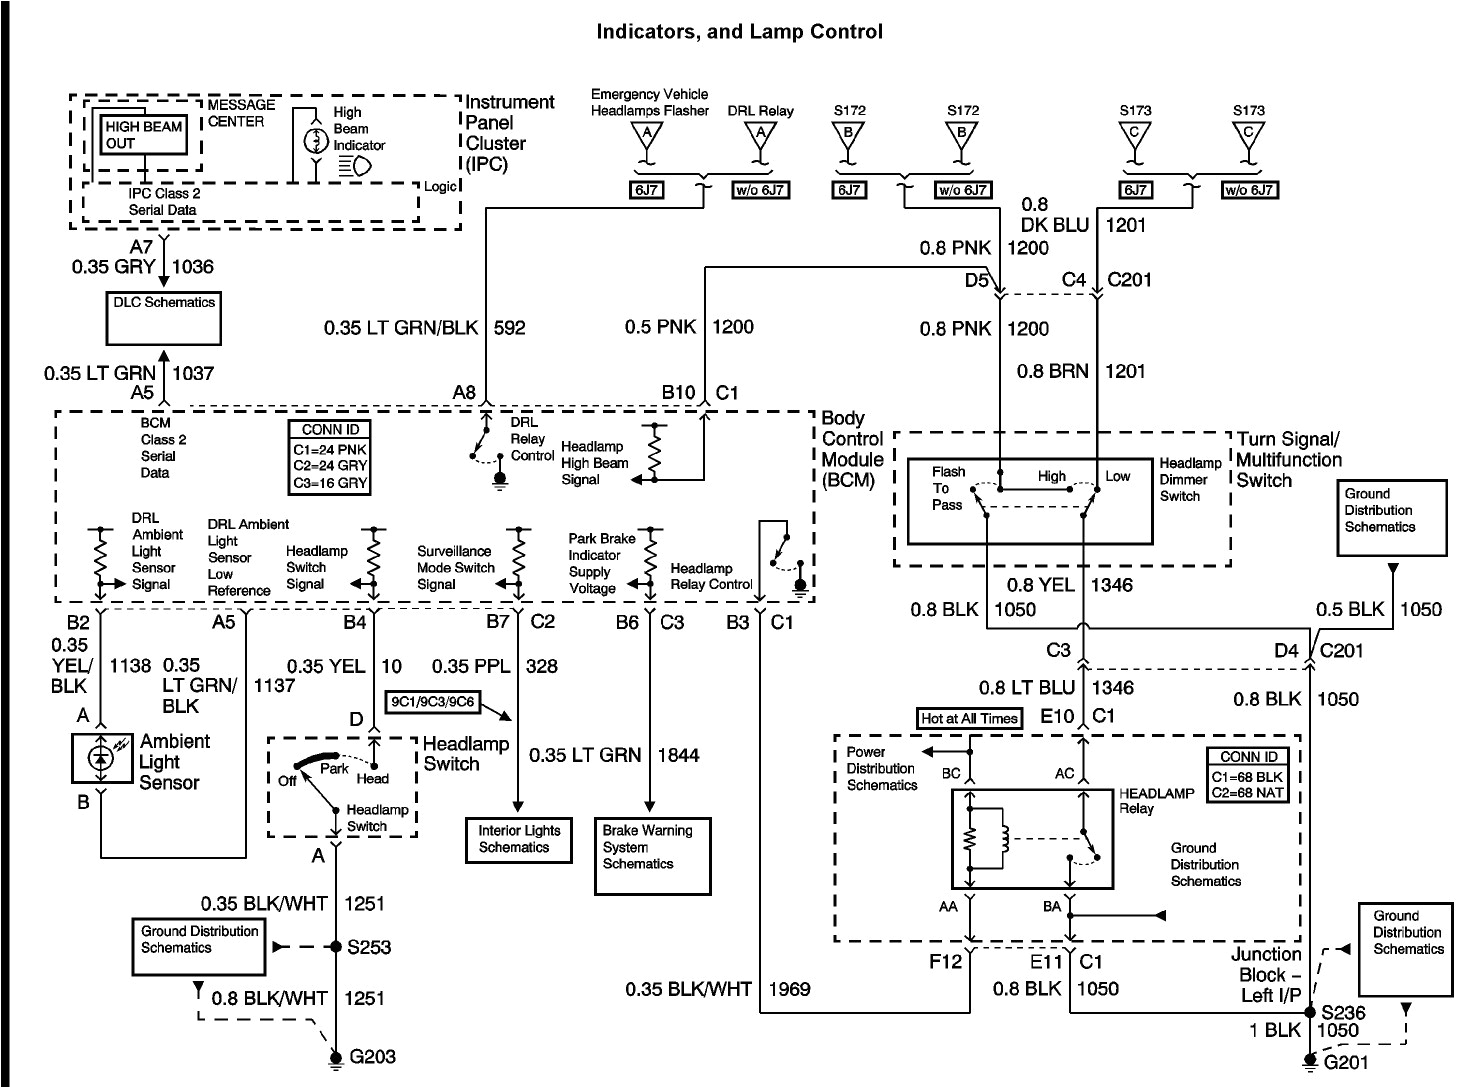 2000 chevrolet impala wiring diagrams wiring diagram sheet 2003 chevy impala headlight dimmer switch wiring diagram